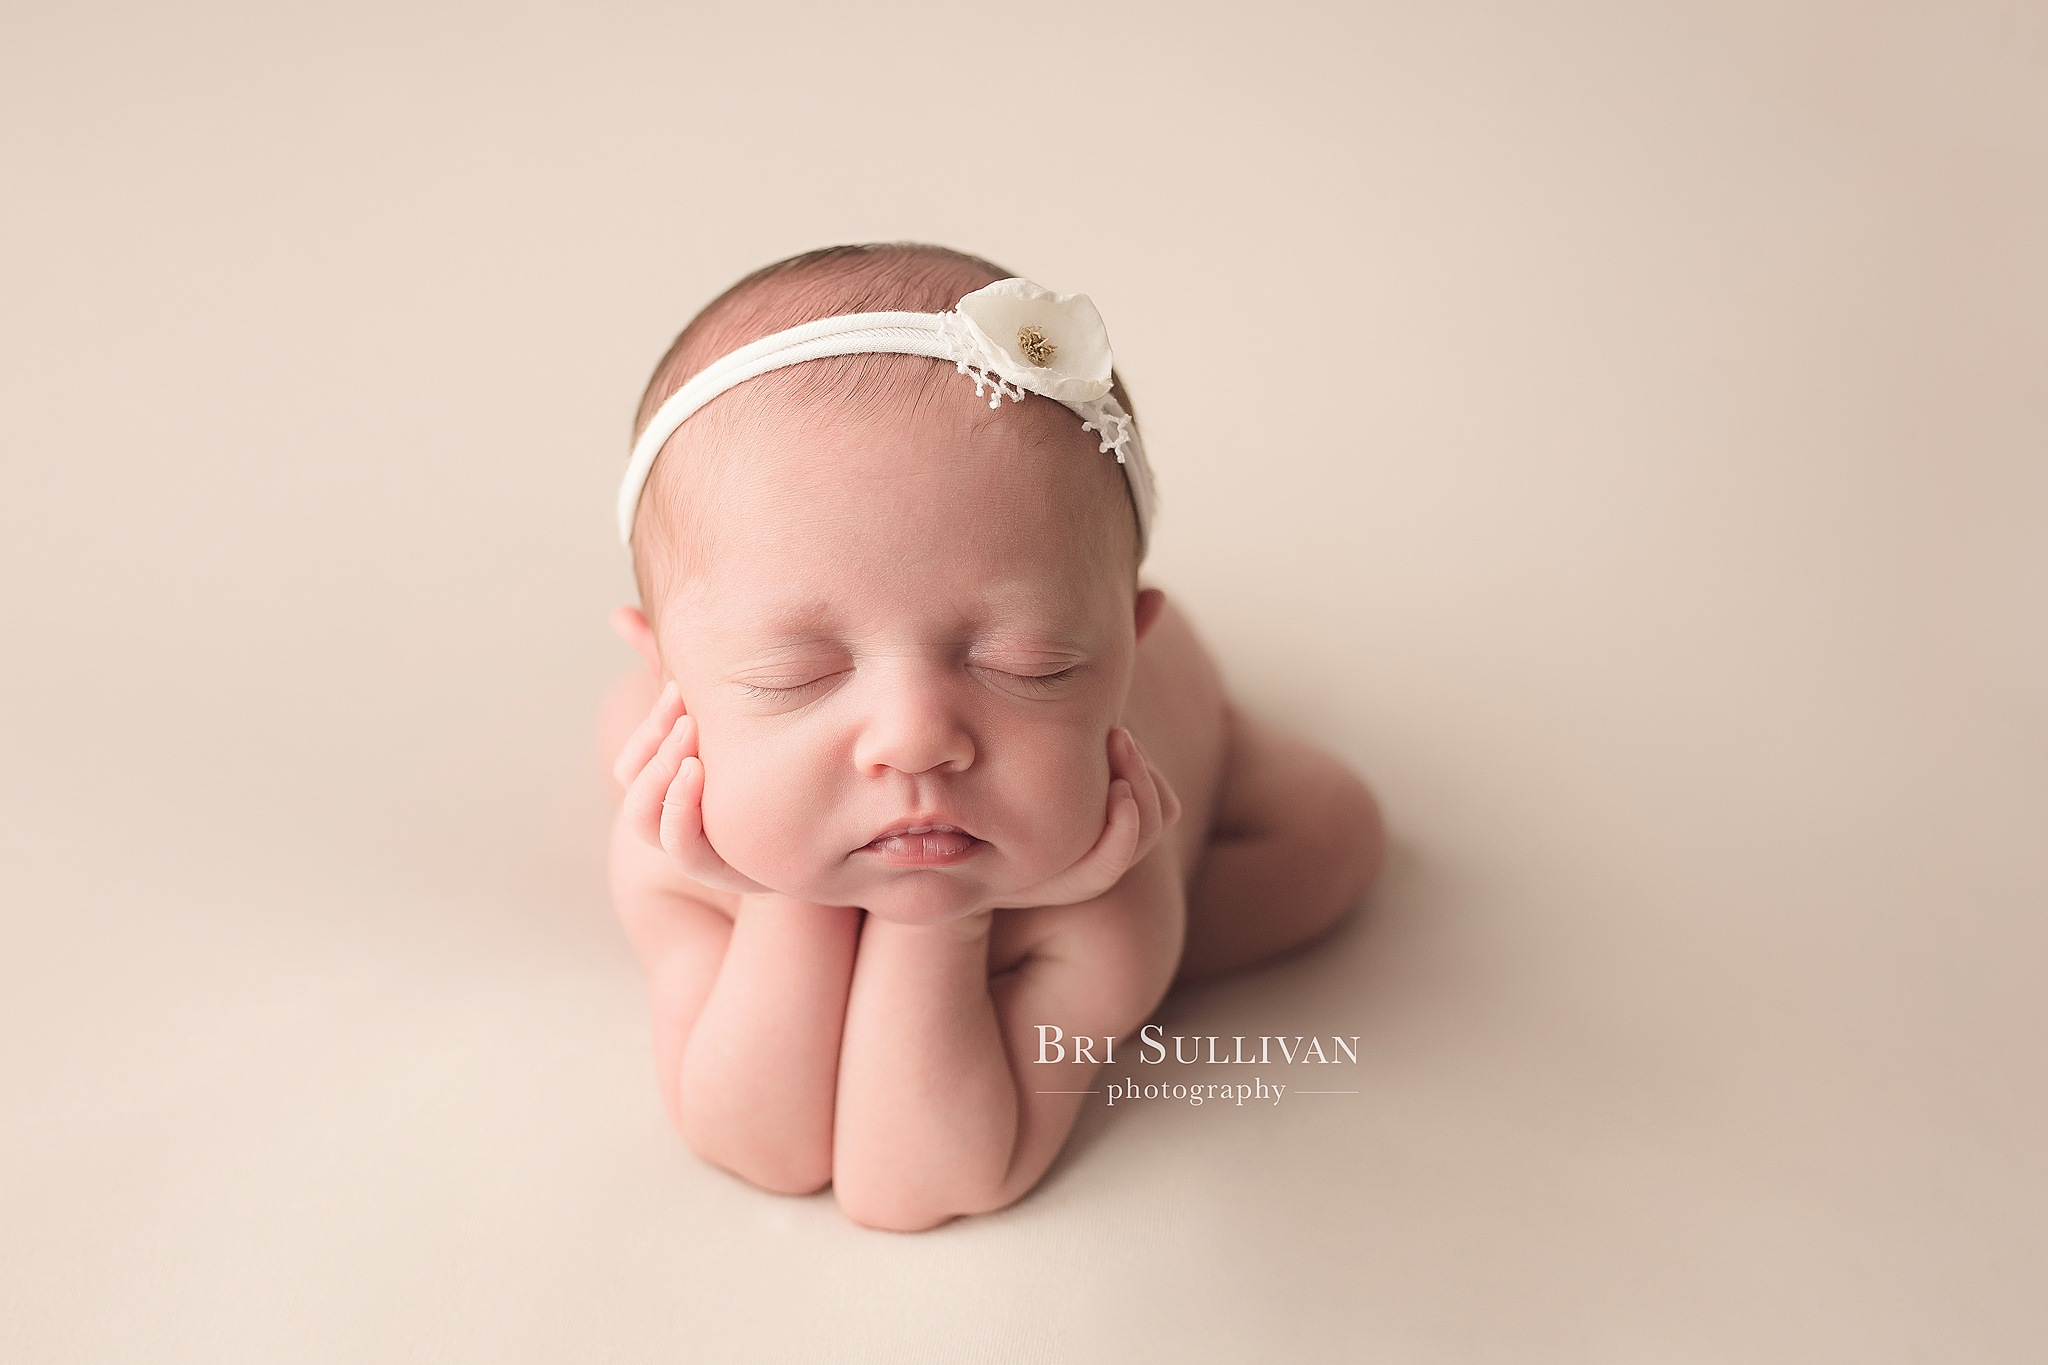 Houston Texas Newborn Photographer by Bri Sullivan by cherrystreetphoto